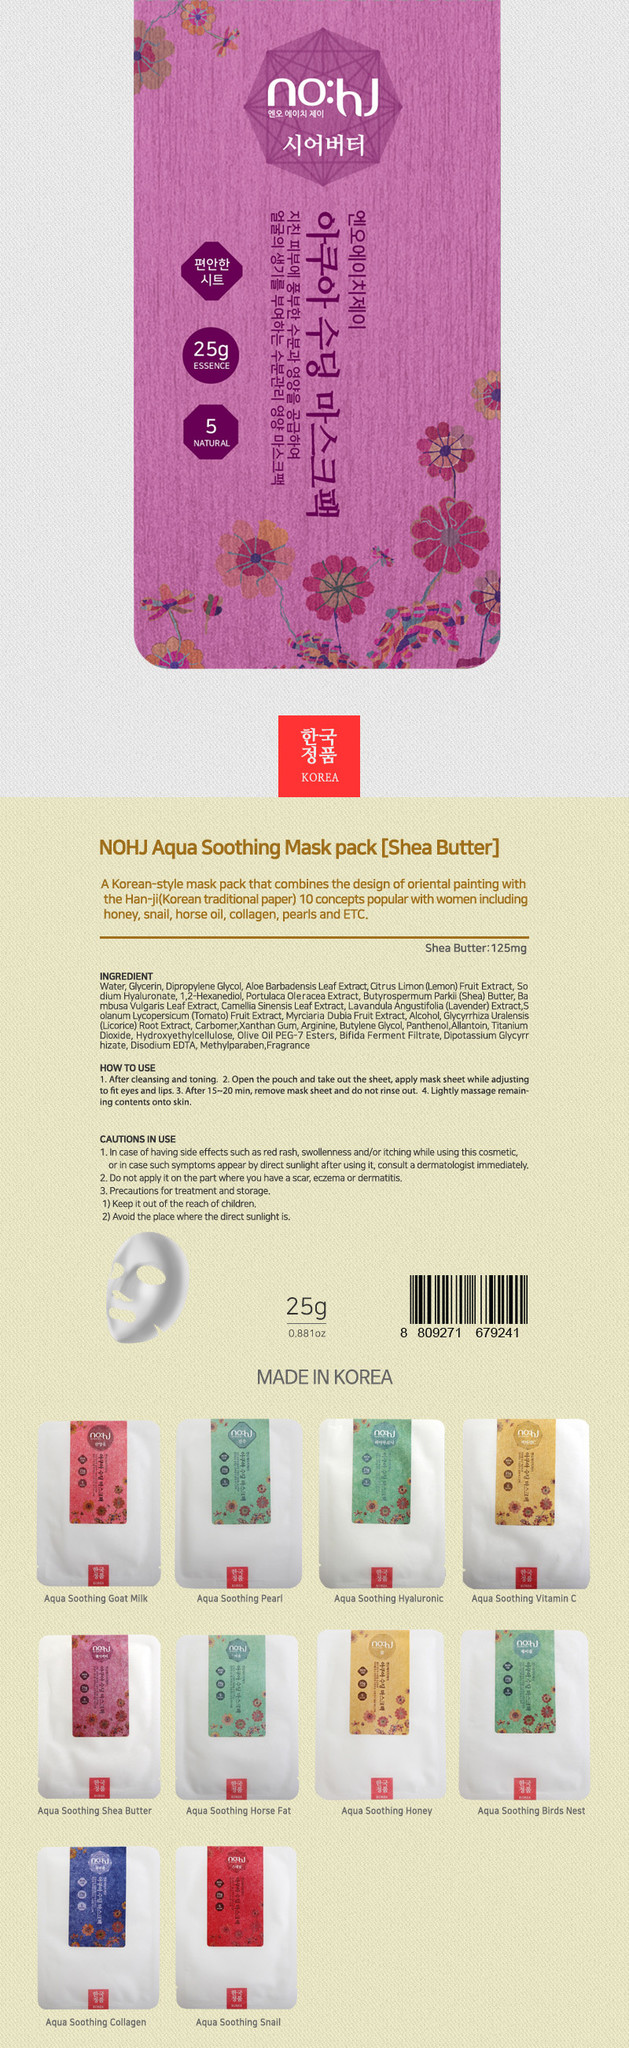 Aqua Soothing Mask pack [Shea Butter]-2